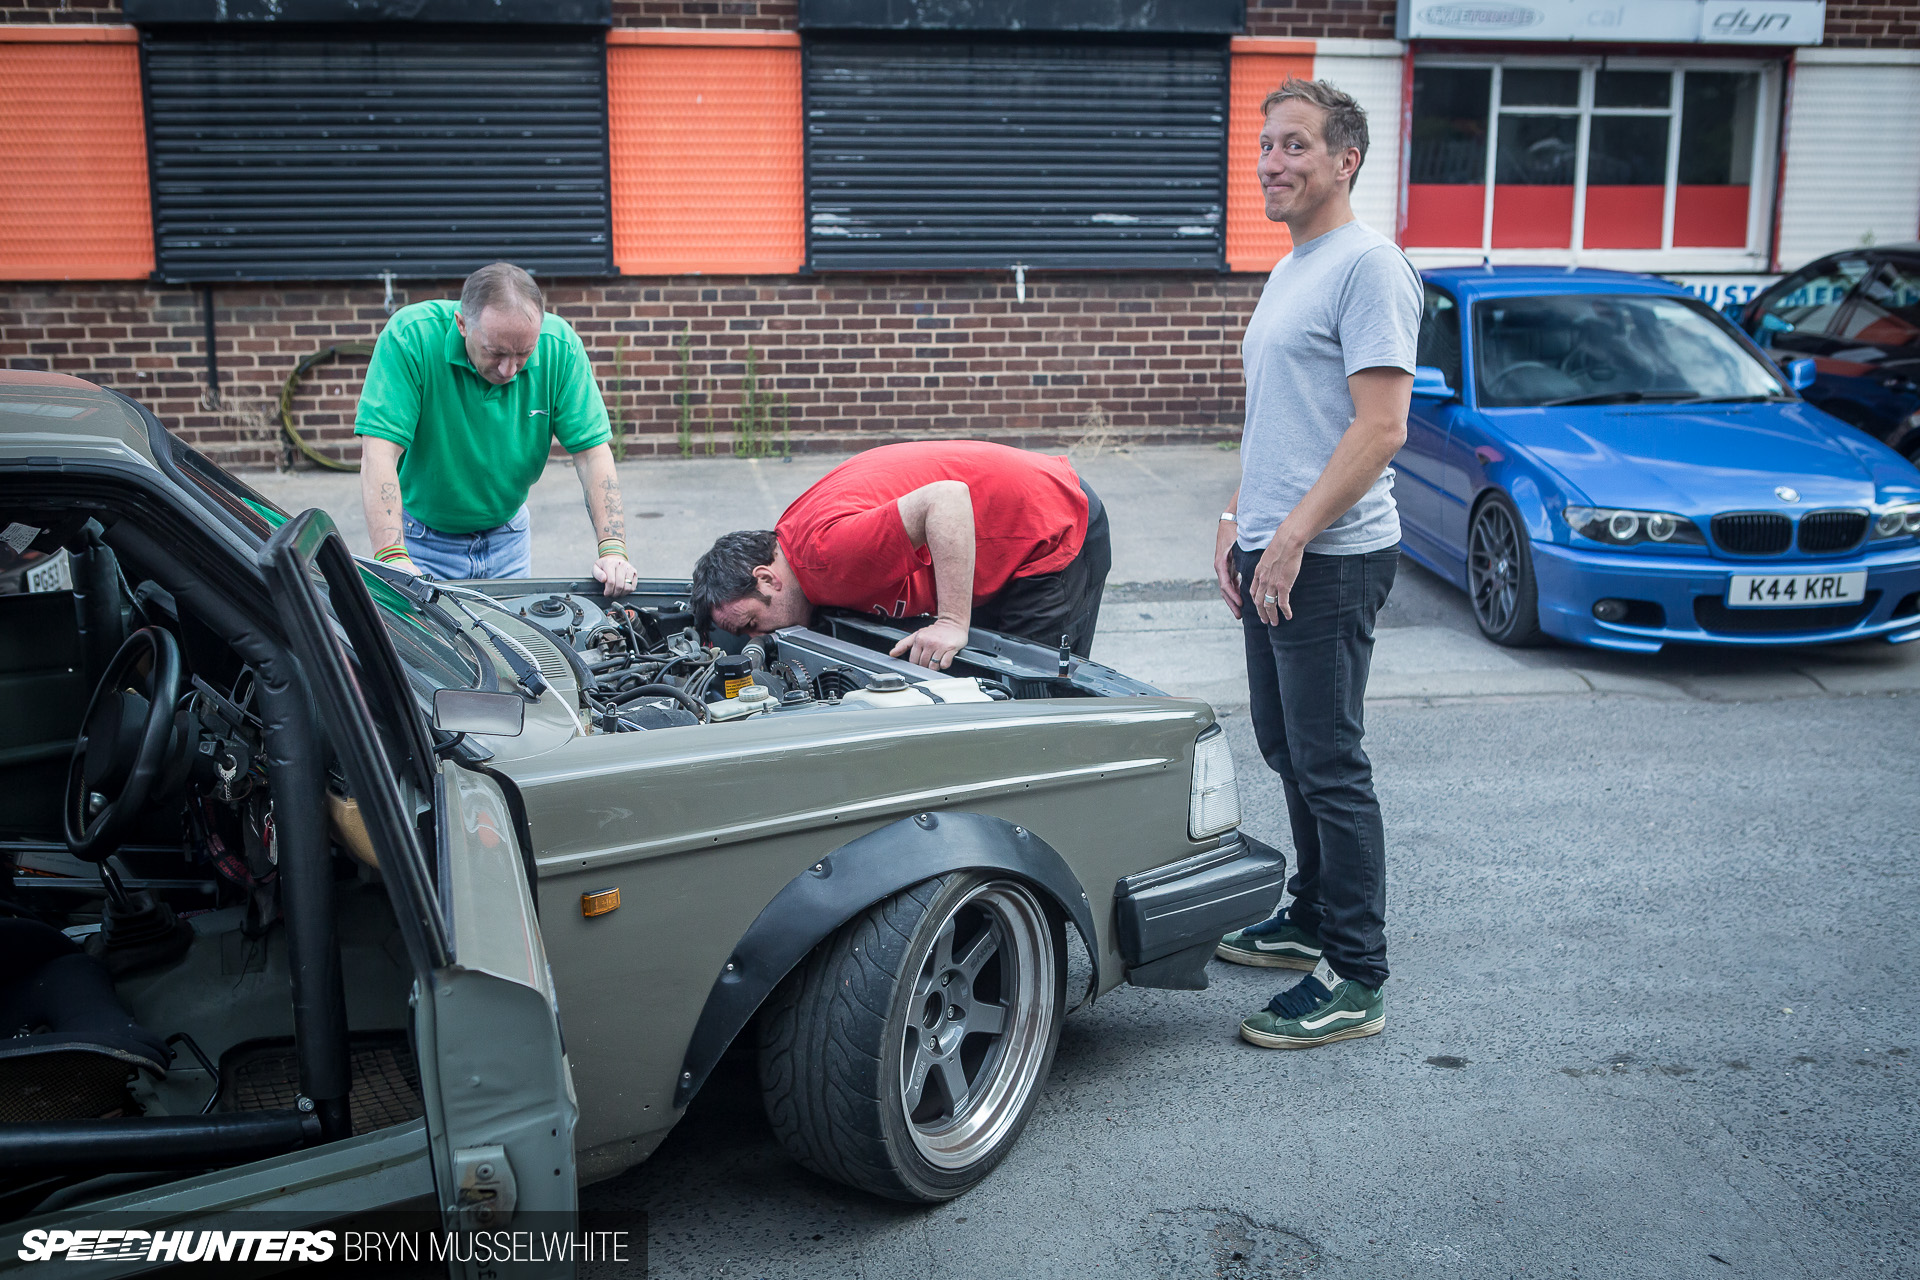 Volvo-turbo-wagon-strip-club-speedhunters-bryn-musselwhite-38-of-179